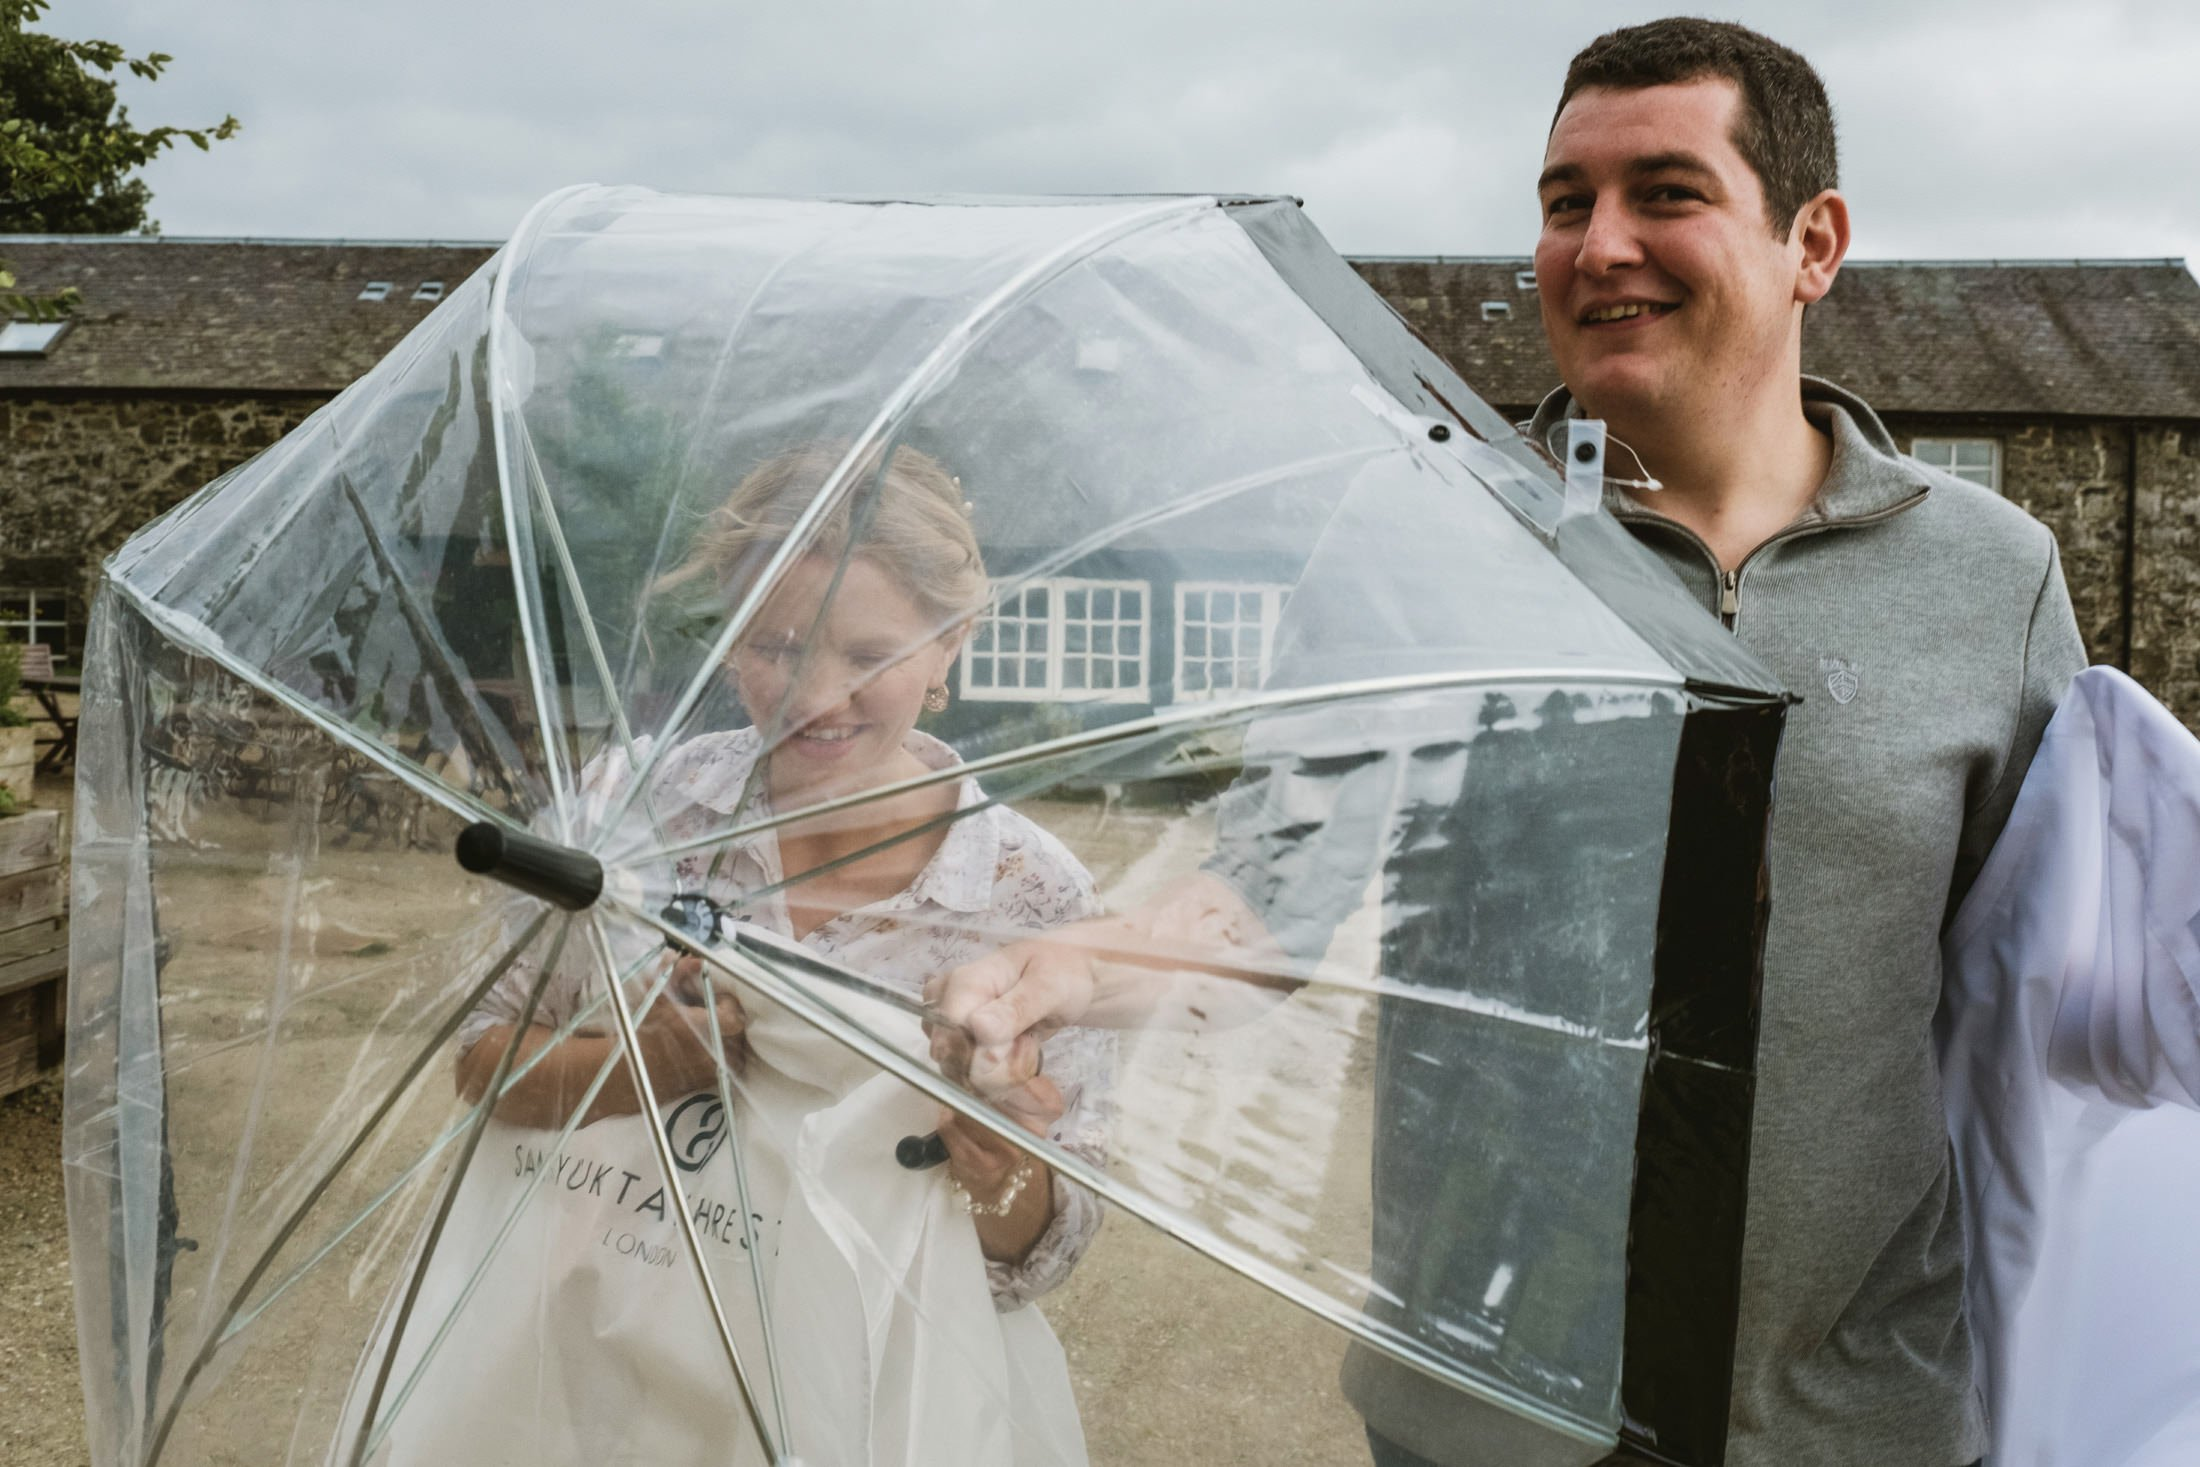 bride and groom walking, bride holding a transparent umbrella